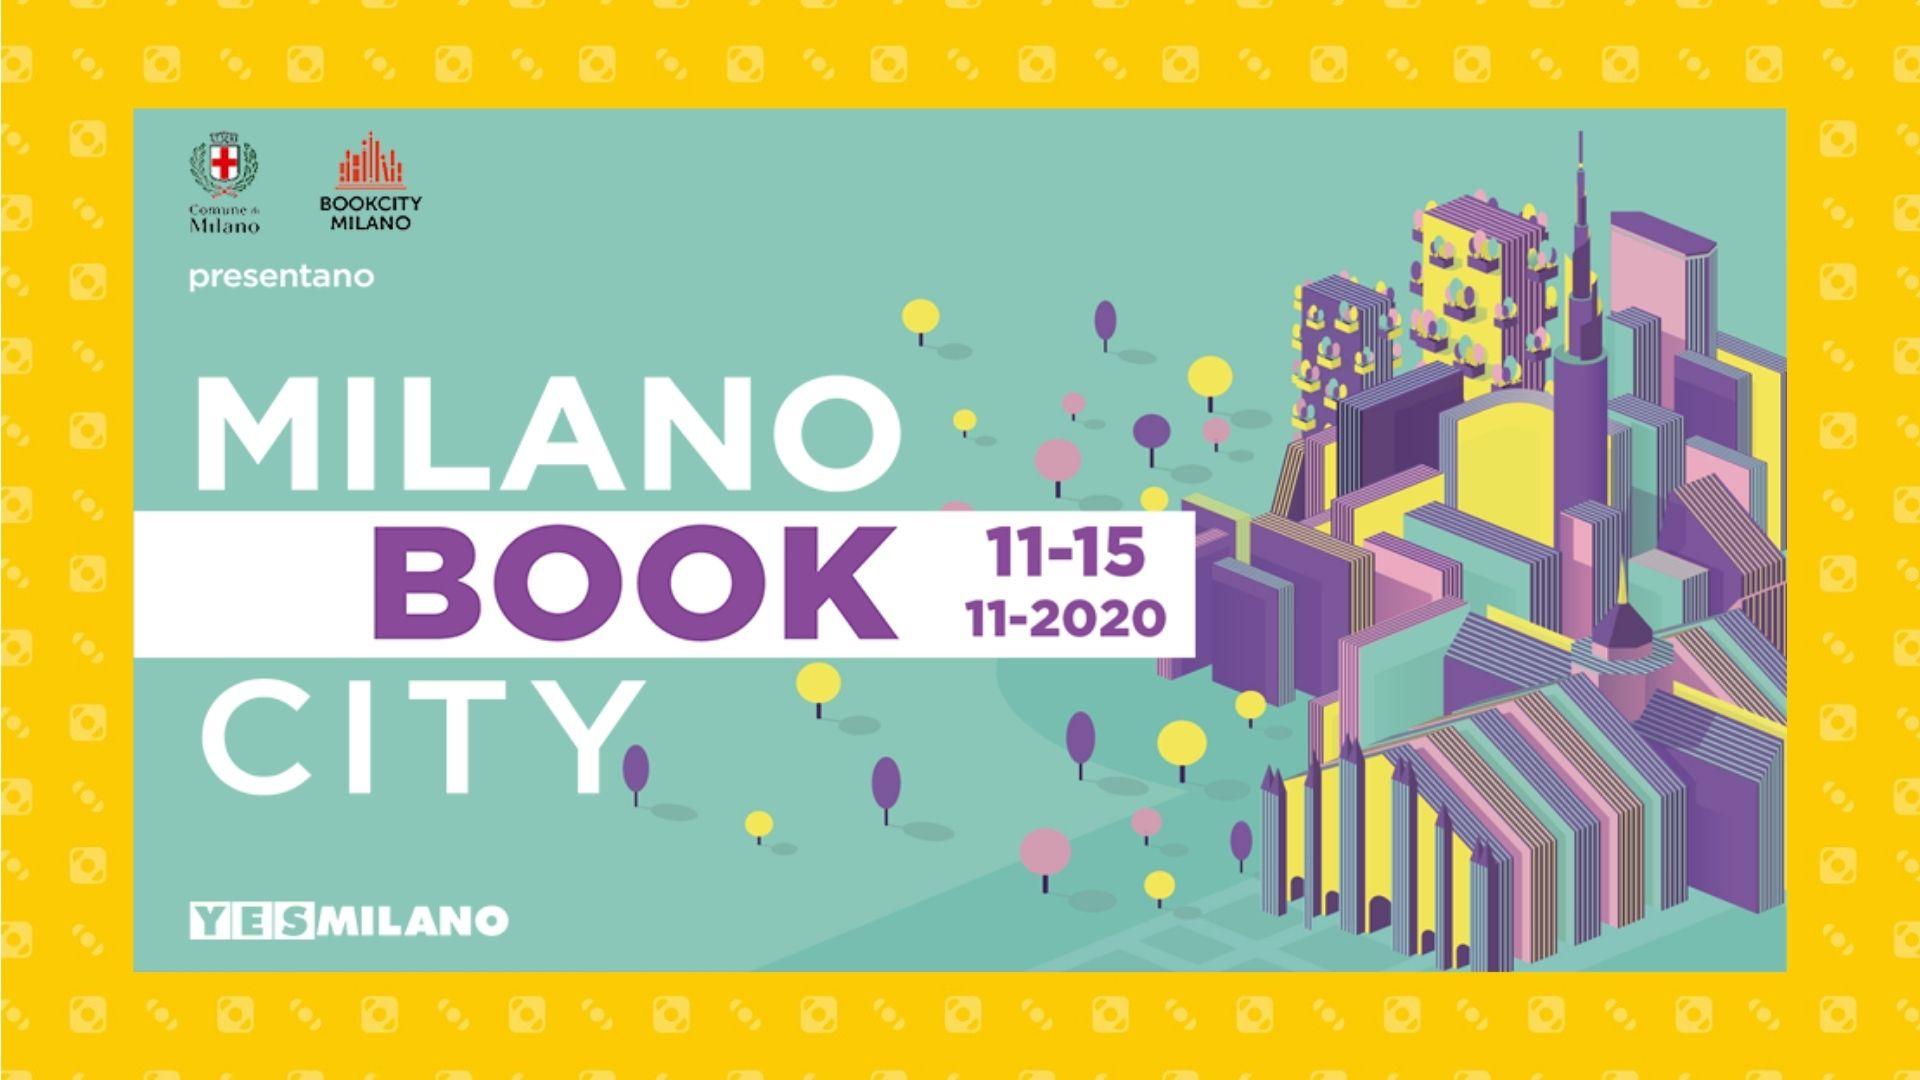 book city 2020